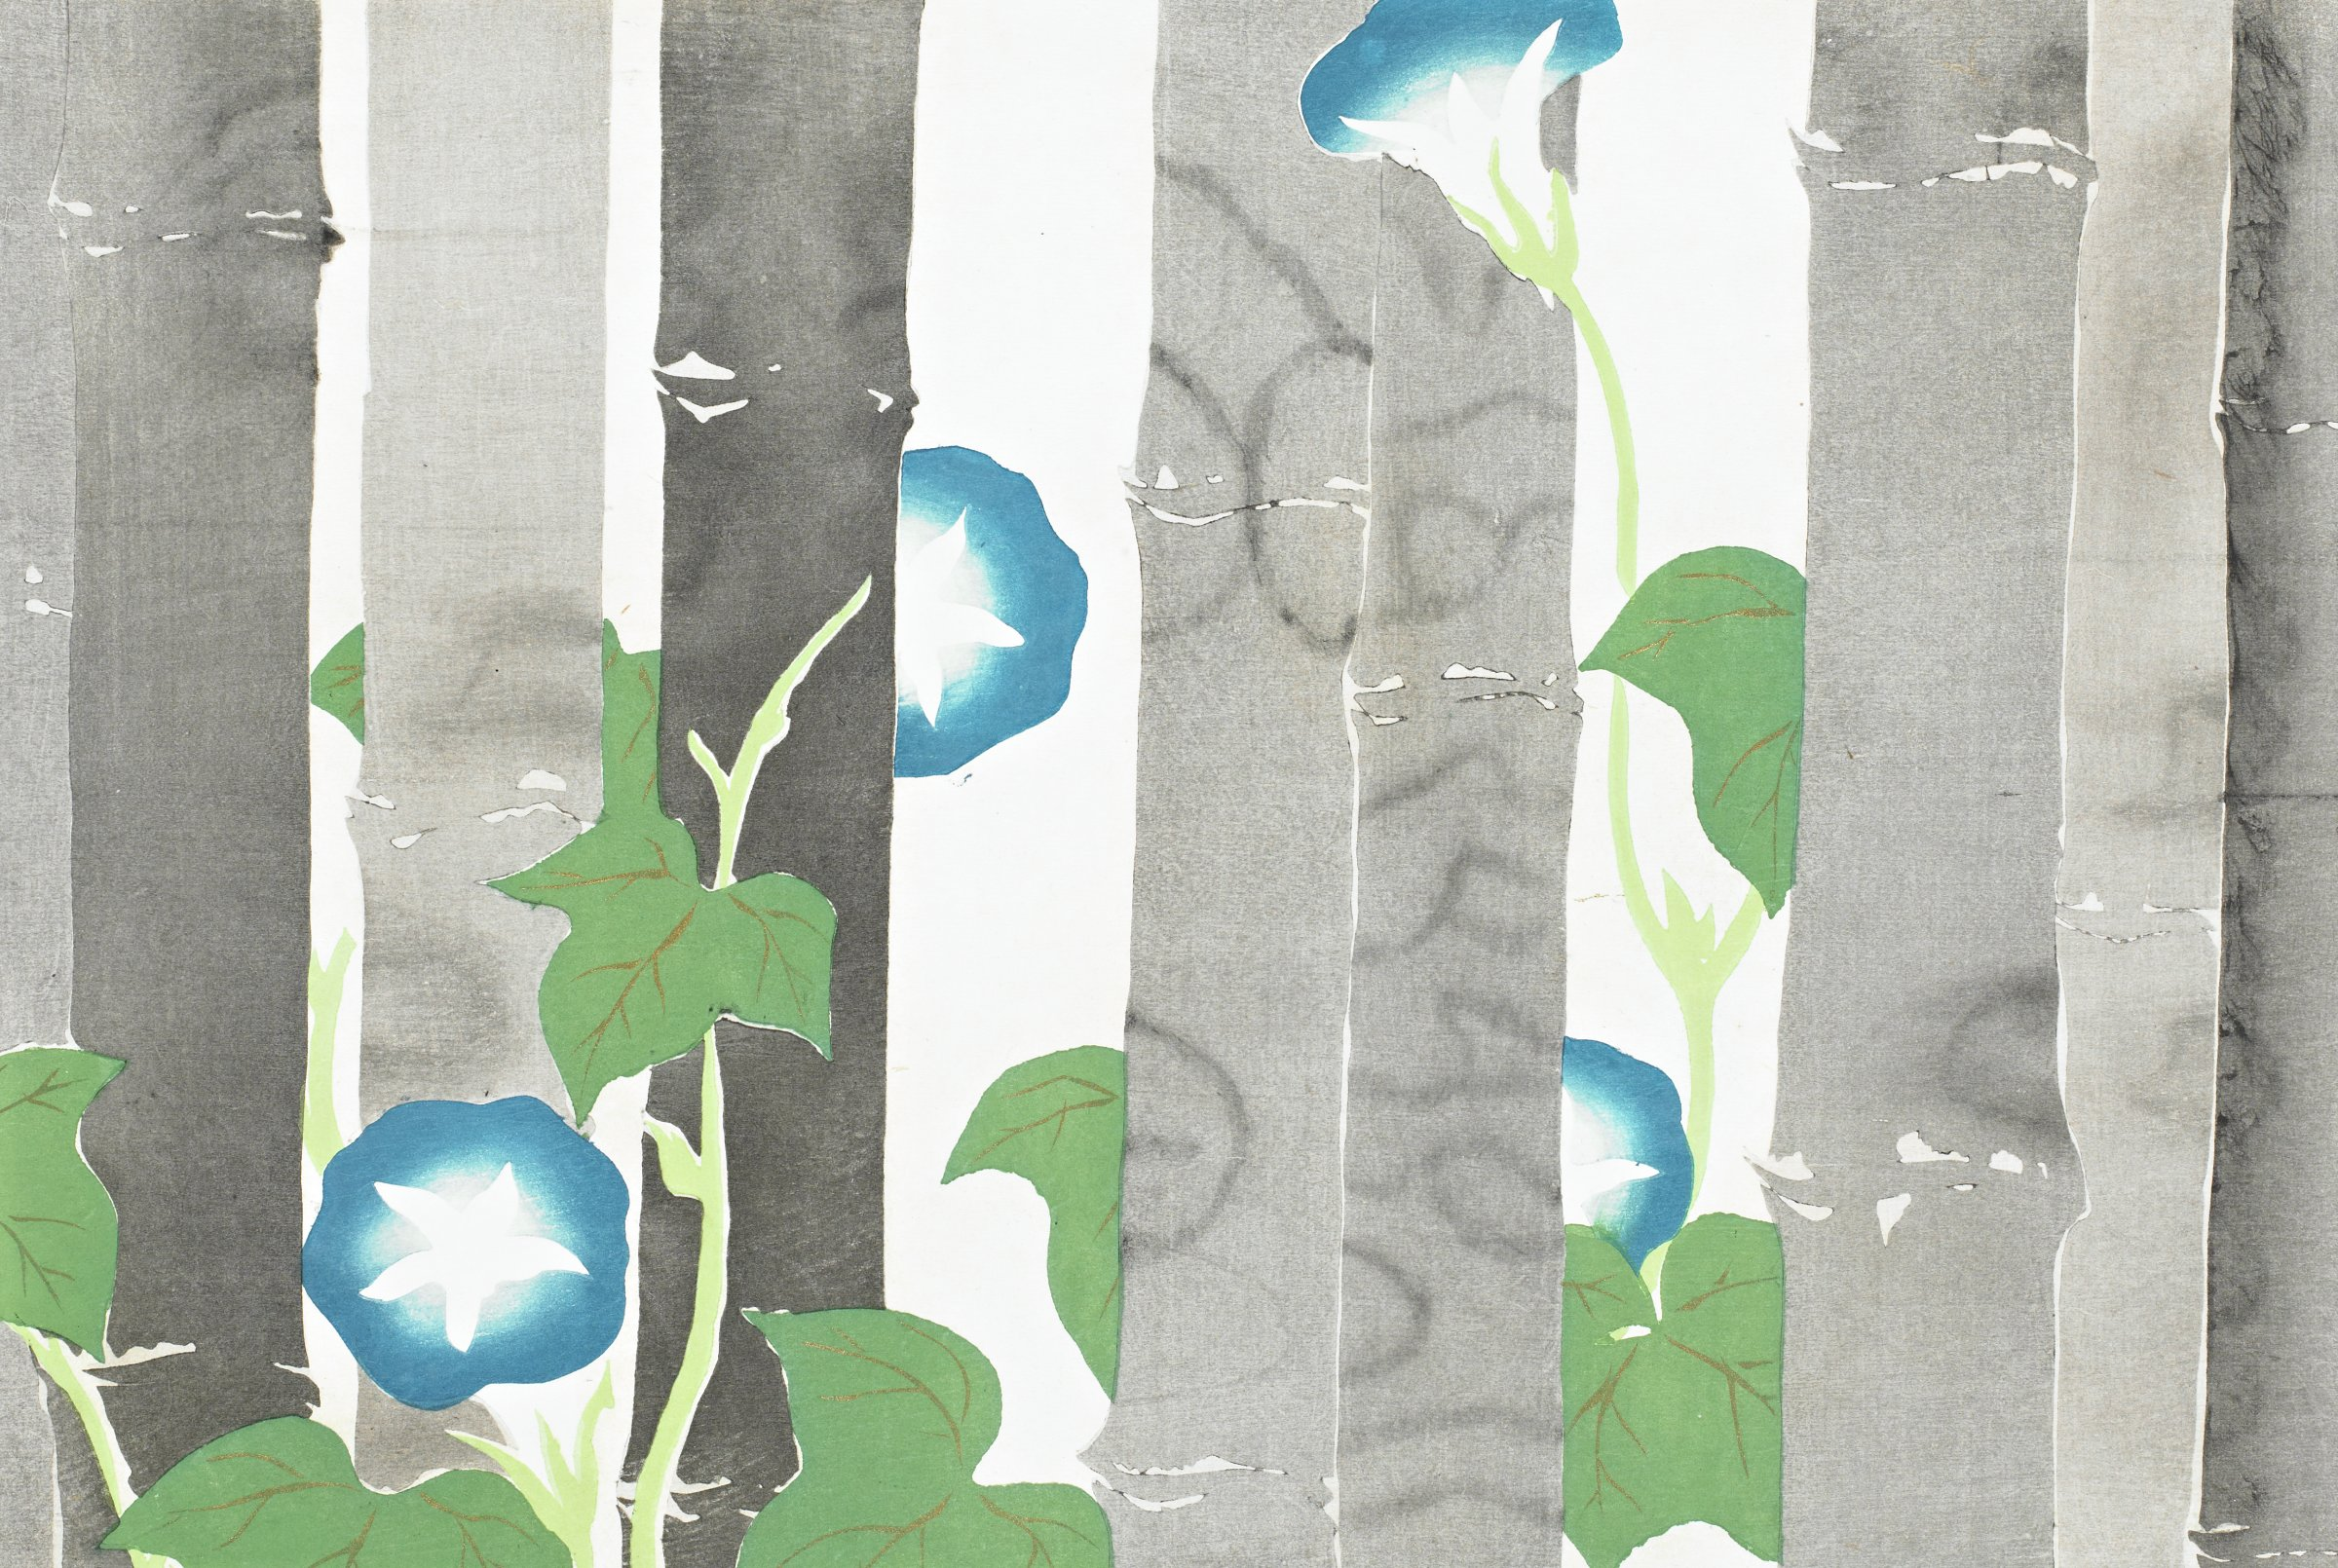 Asagao (Morning Glories), from Momoyogusa (A World of Things), Volume 1, Kamisaka Sekka, ink and color on paper